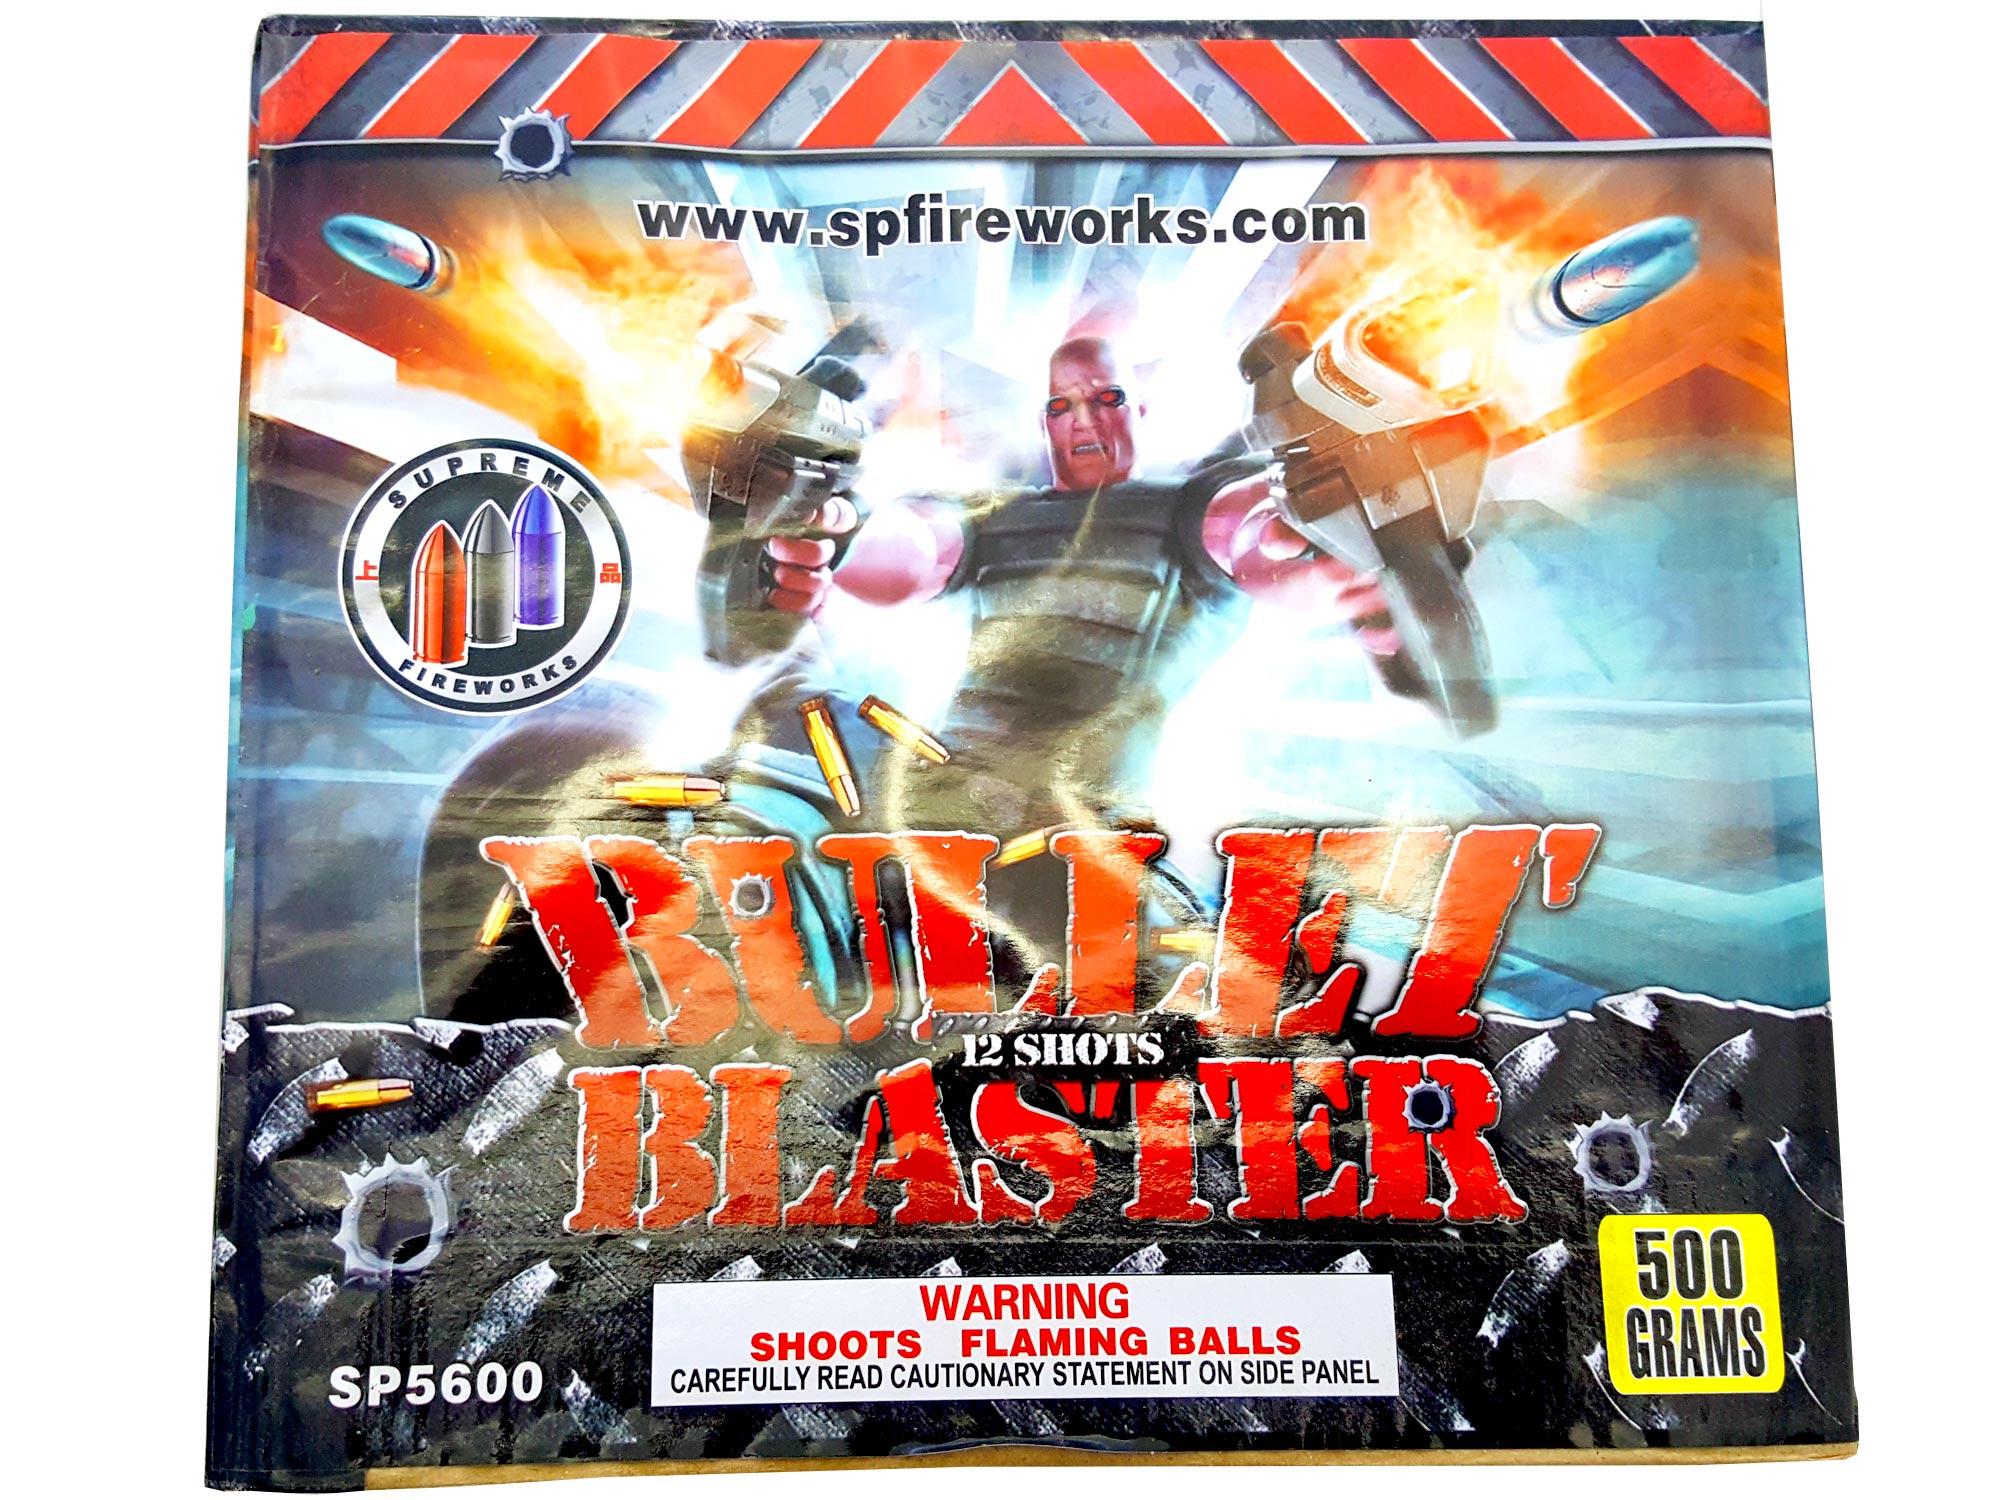 Mr-W_Bullet_Blaster_02